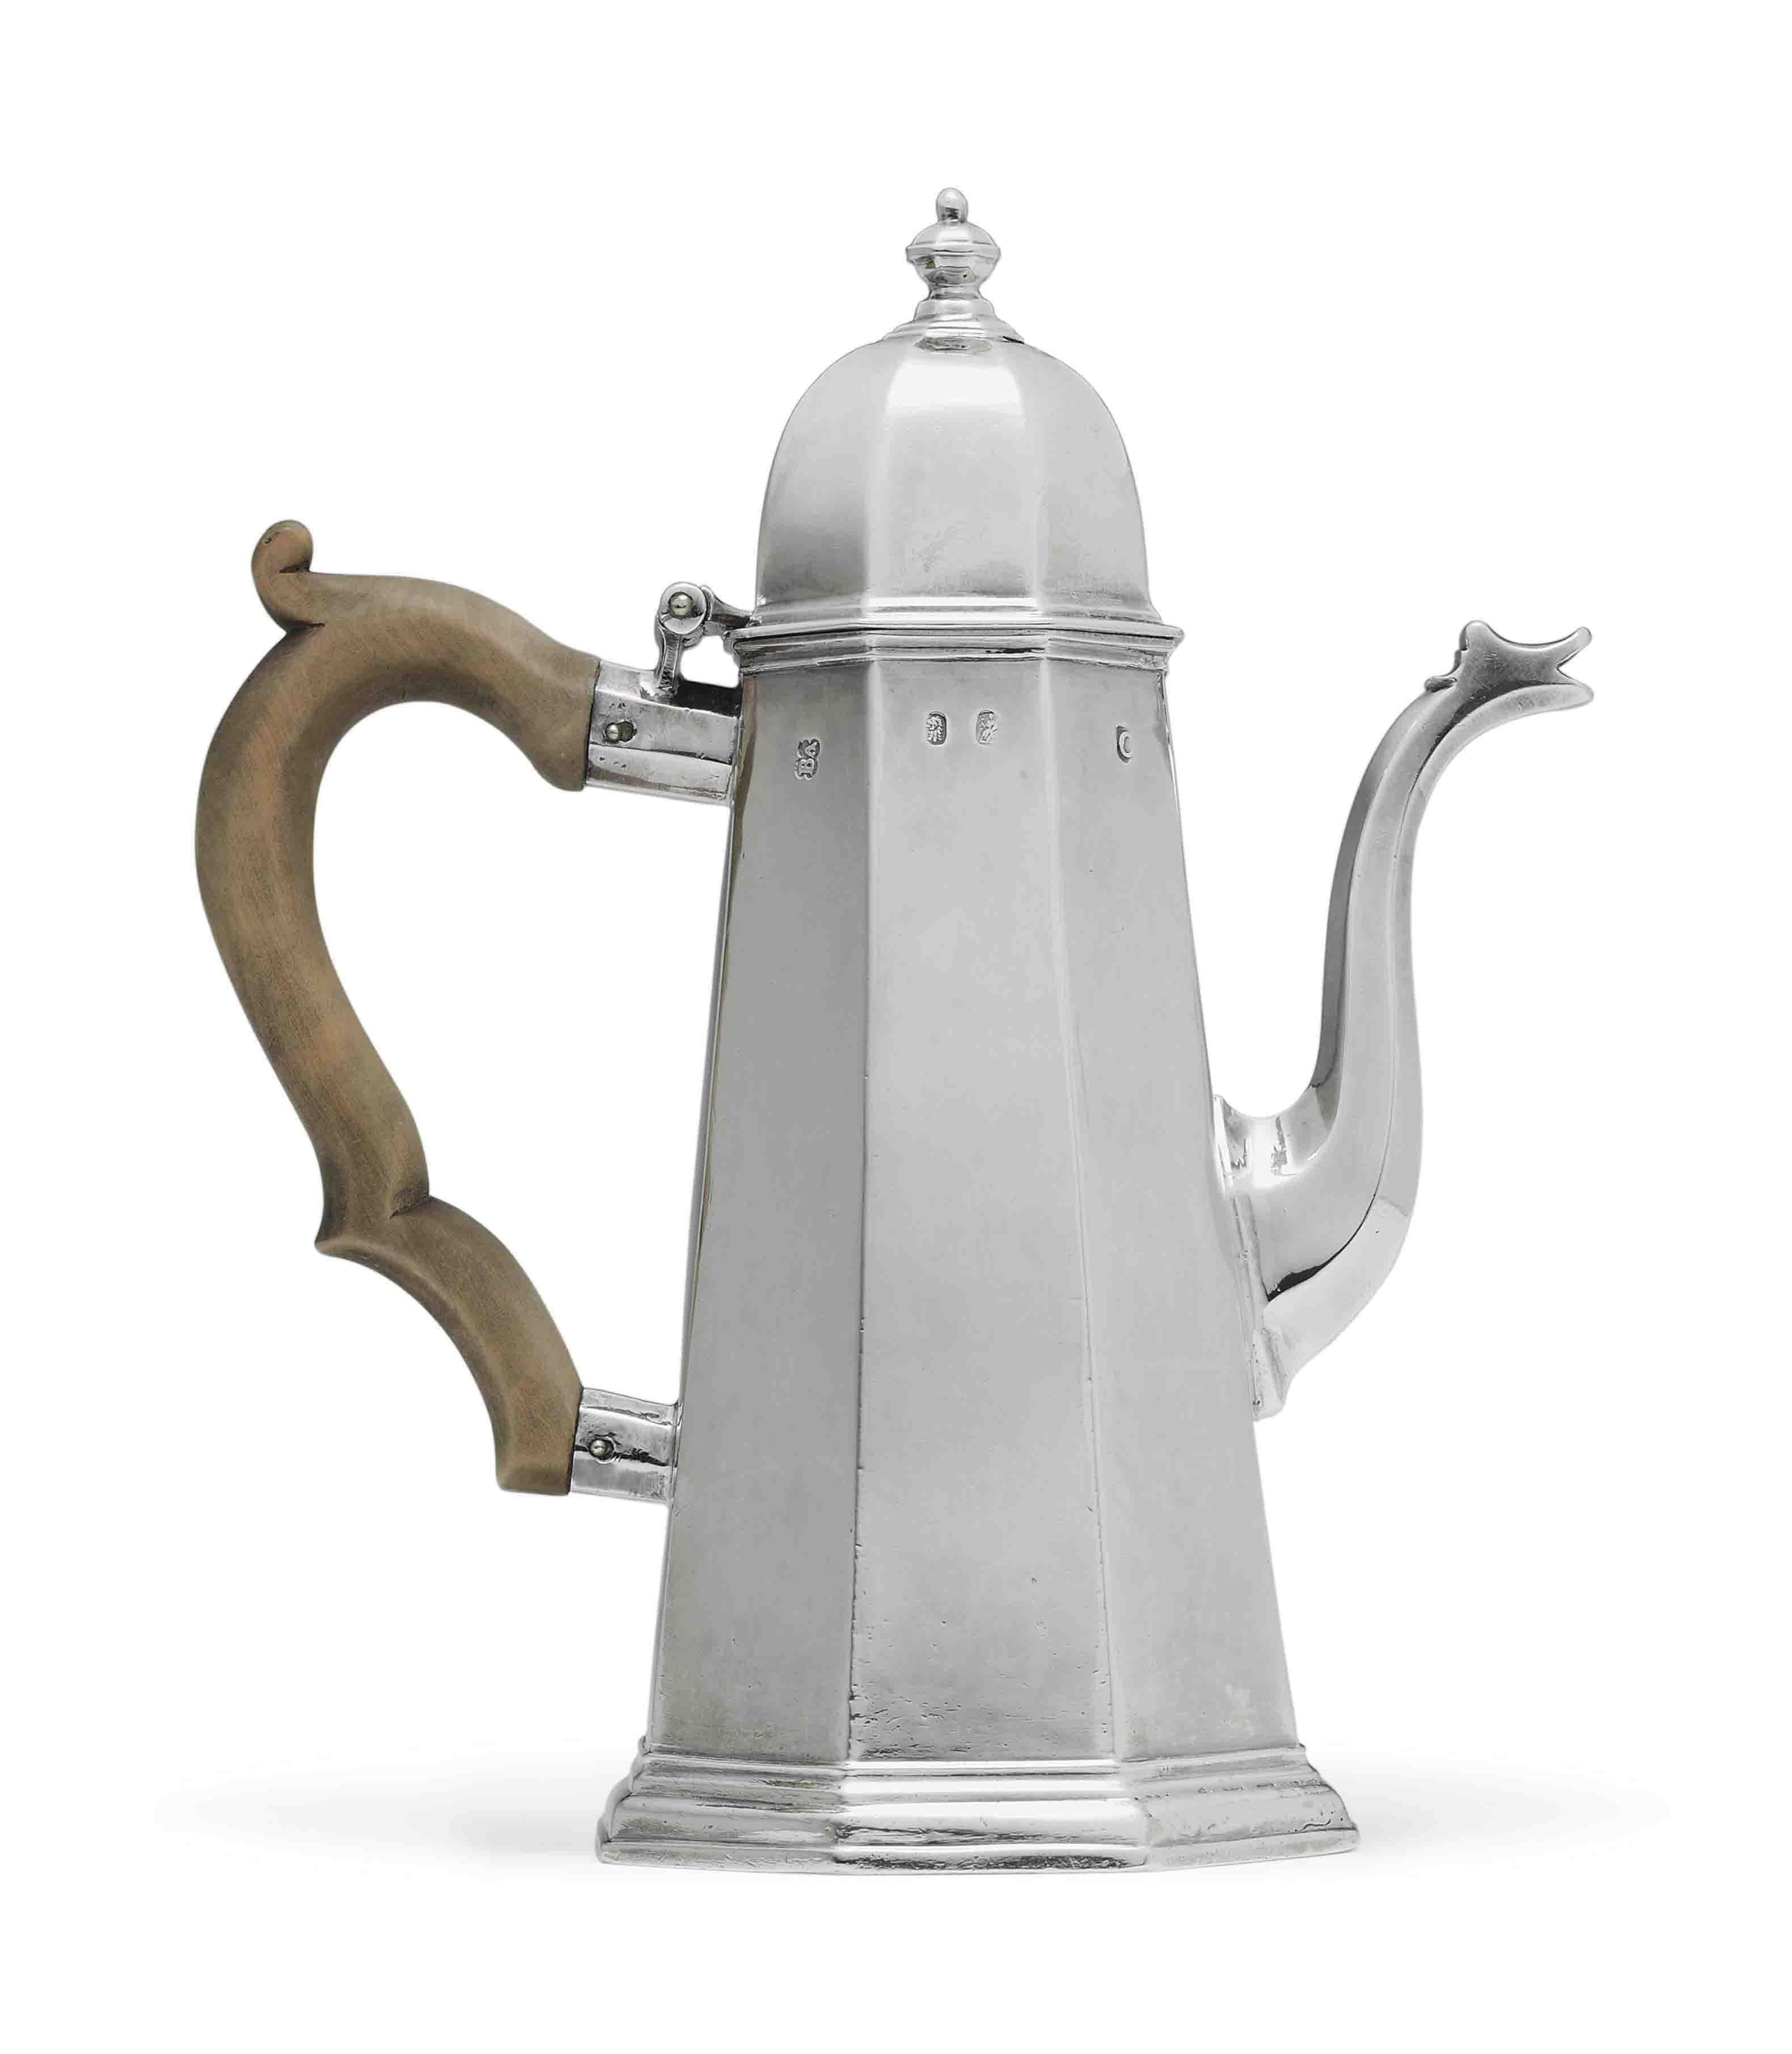 A GEORGE I SILVER COFFEE POT